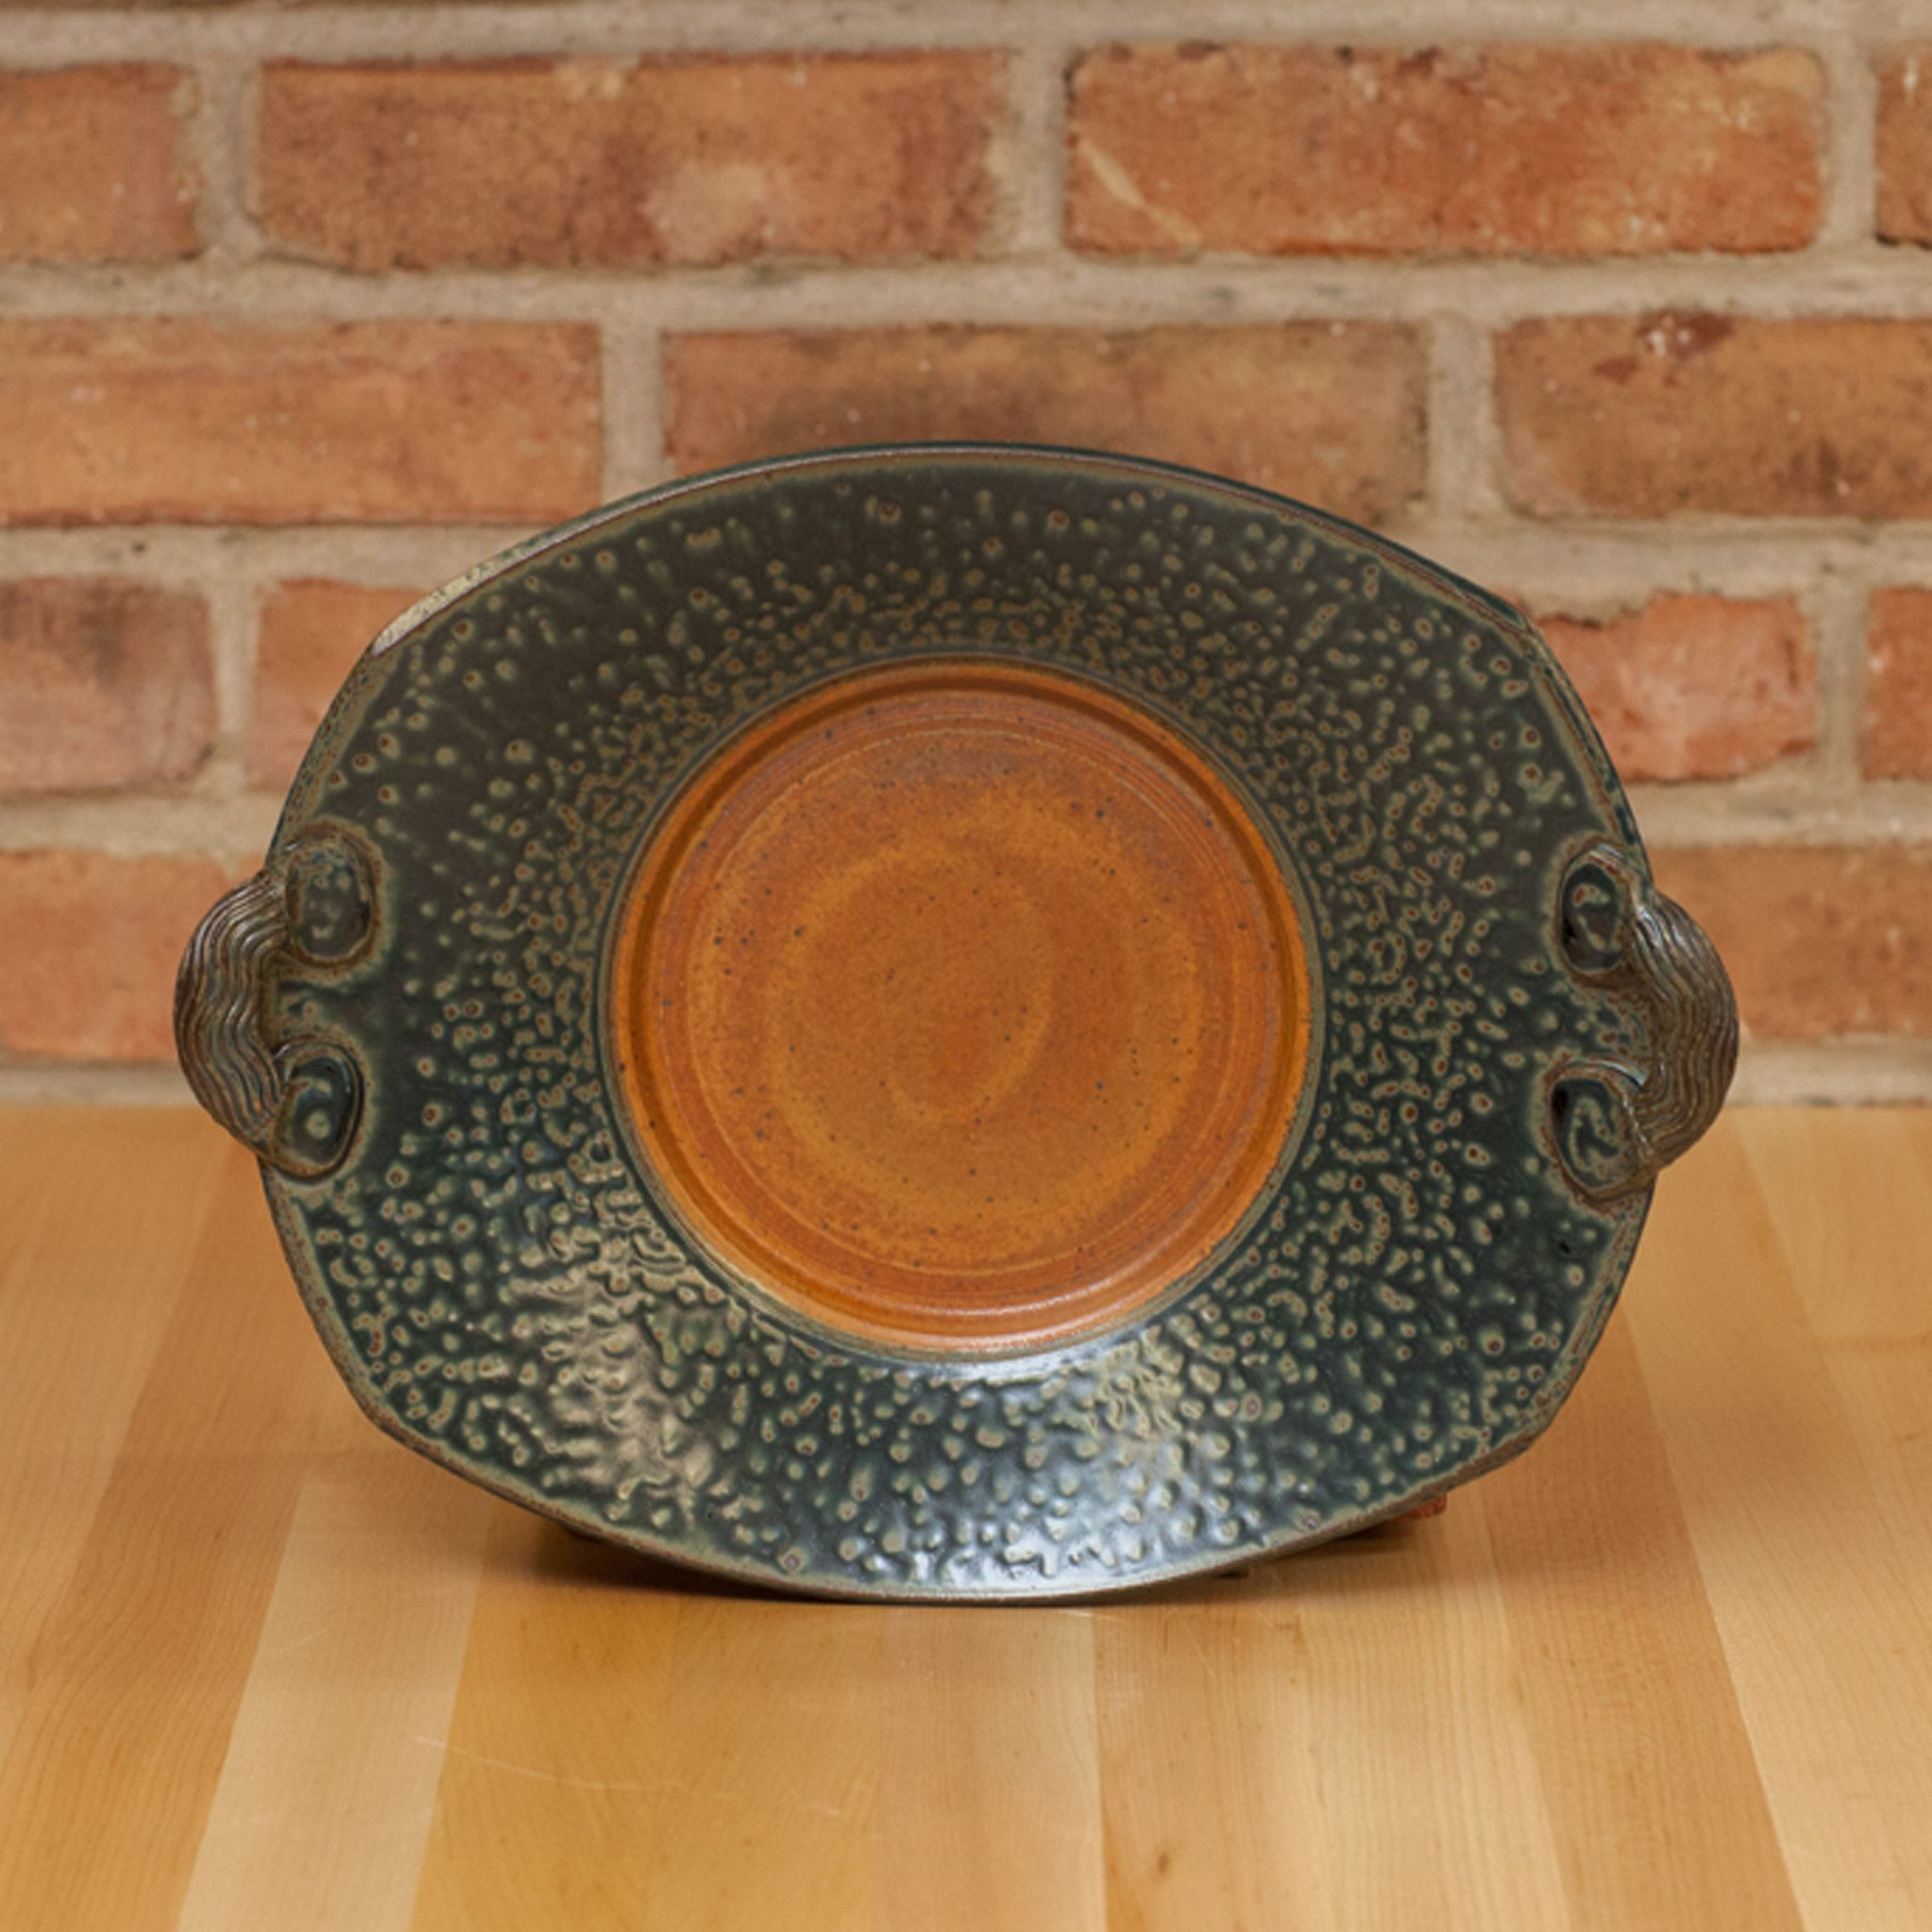 Royce Yoder - Rectangle Handled Plate in Tan | Ash Glaze